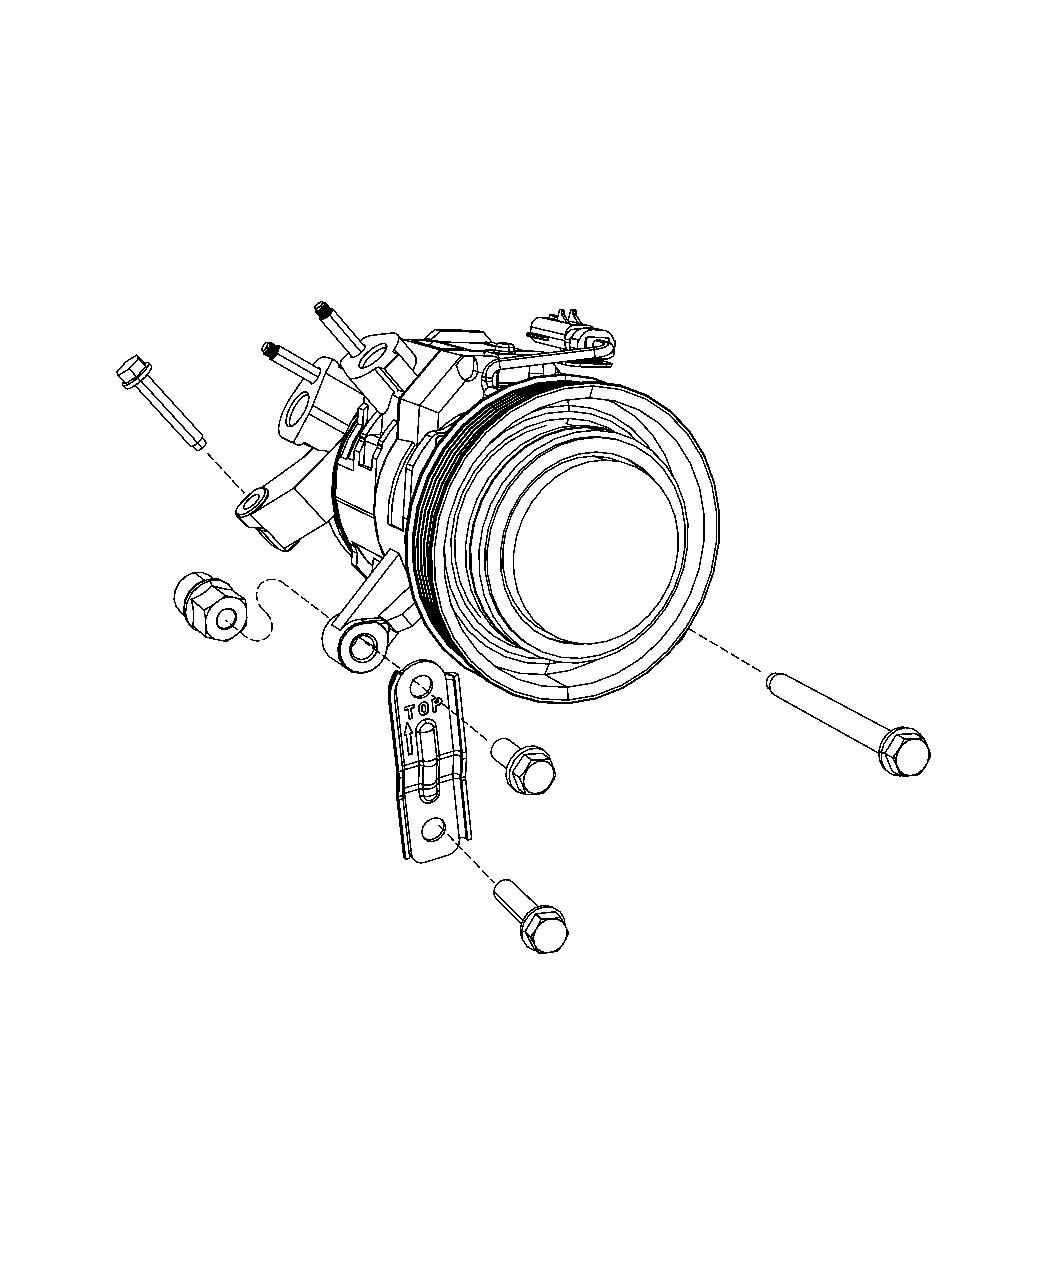 Cvr Performance 545v Starter Drive Assembly